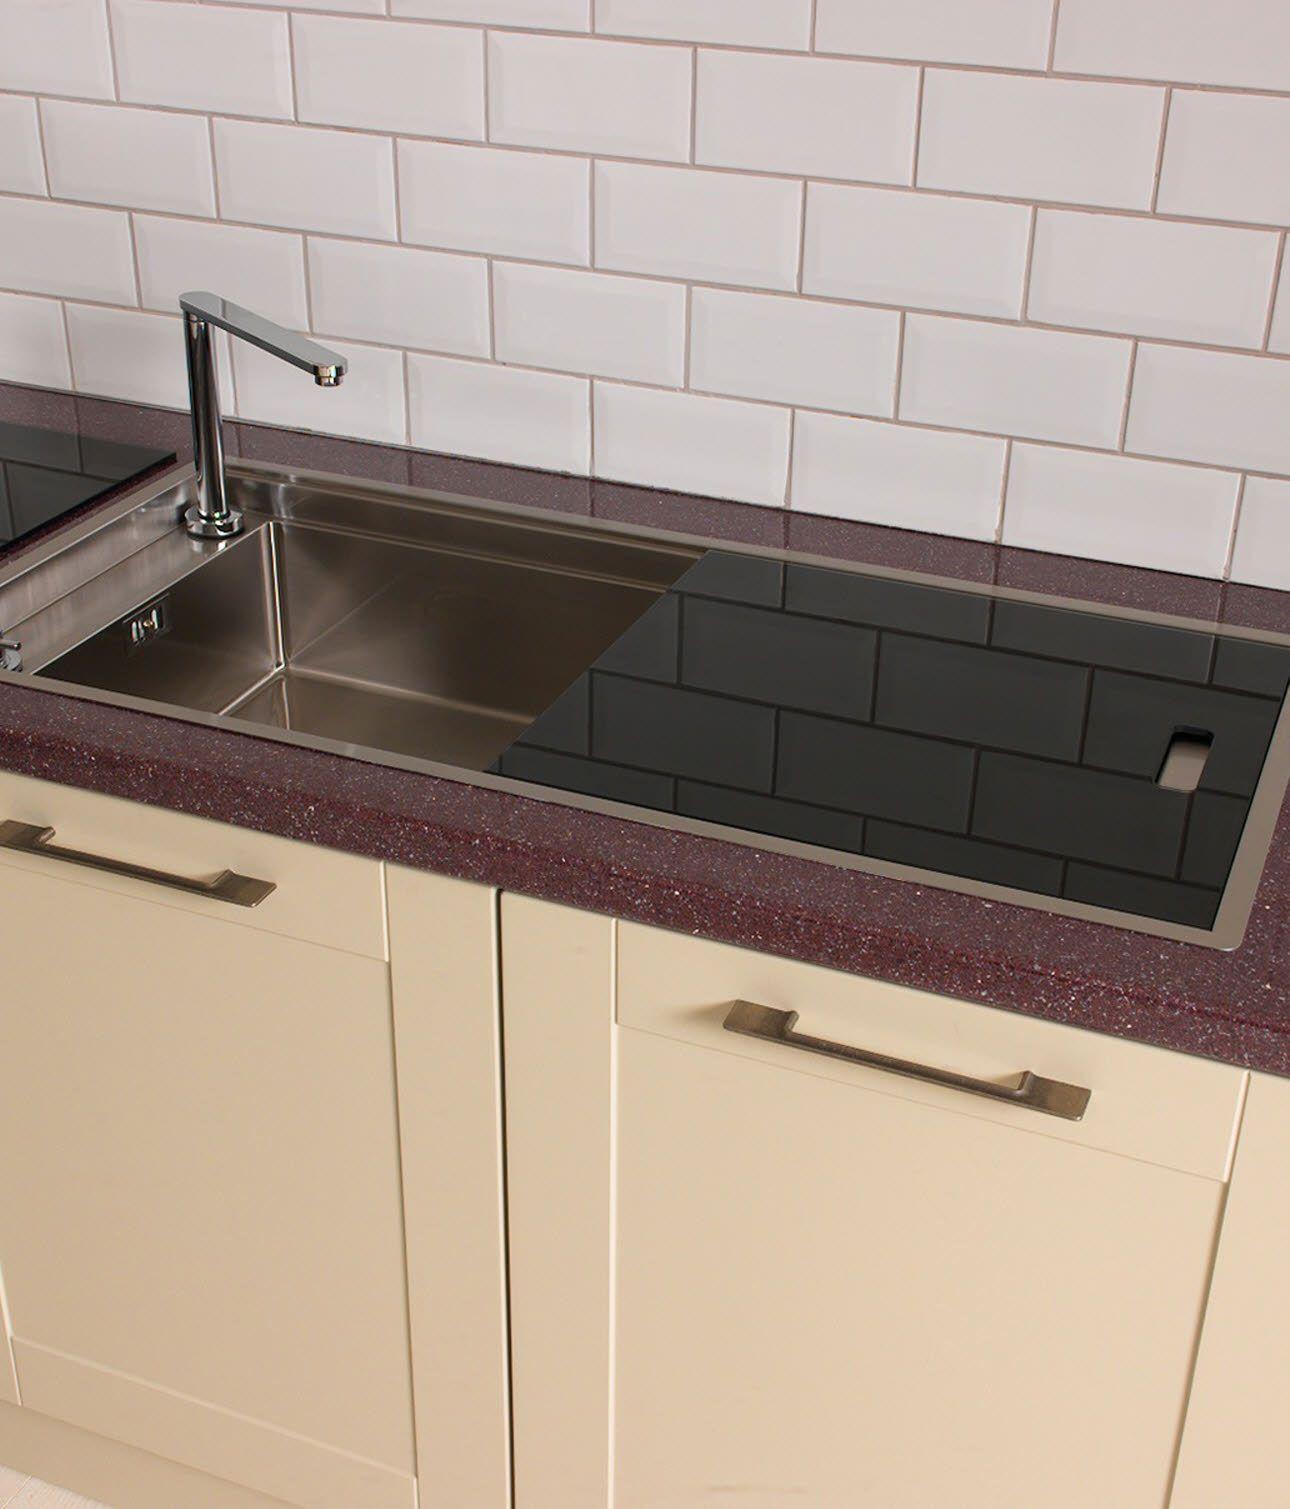 Astracast Illusion 1B1D Sink | Kitchen | Pinterest | Sinks and ...